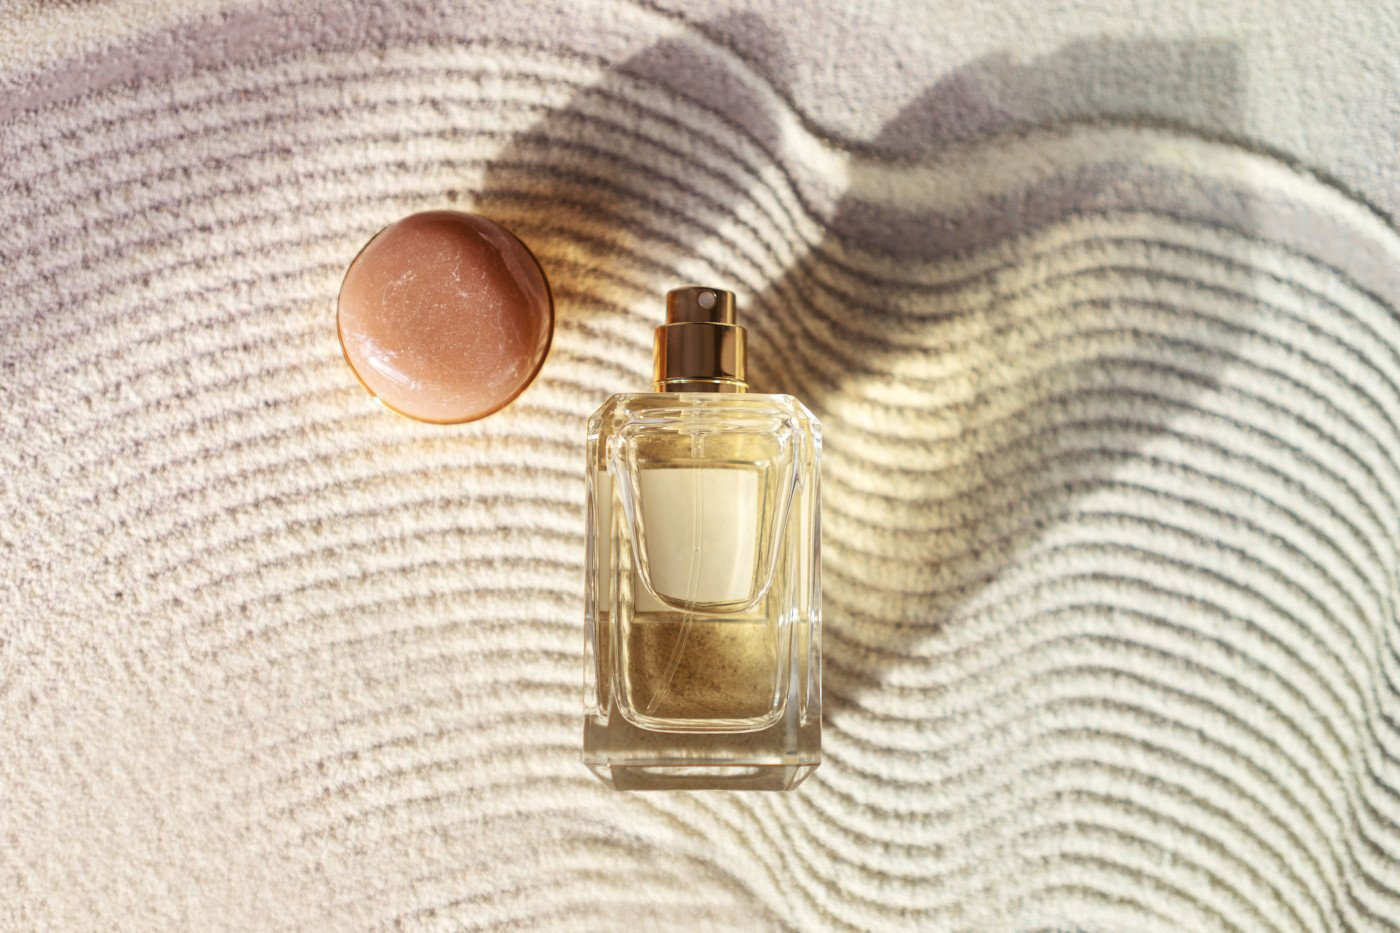 Solar Fragrances - Let the sun tender your skin